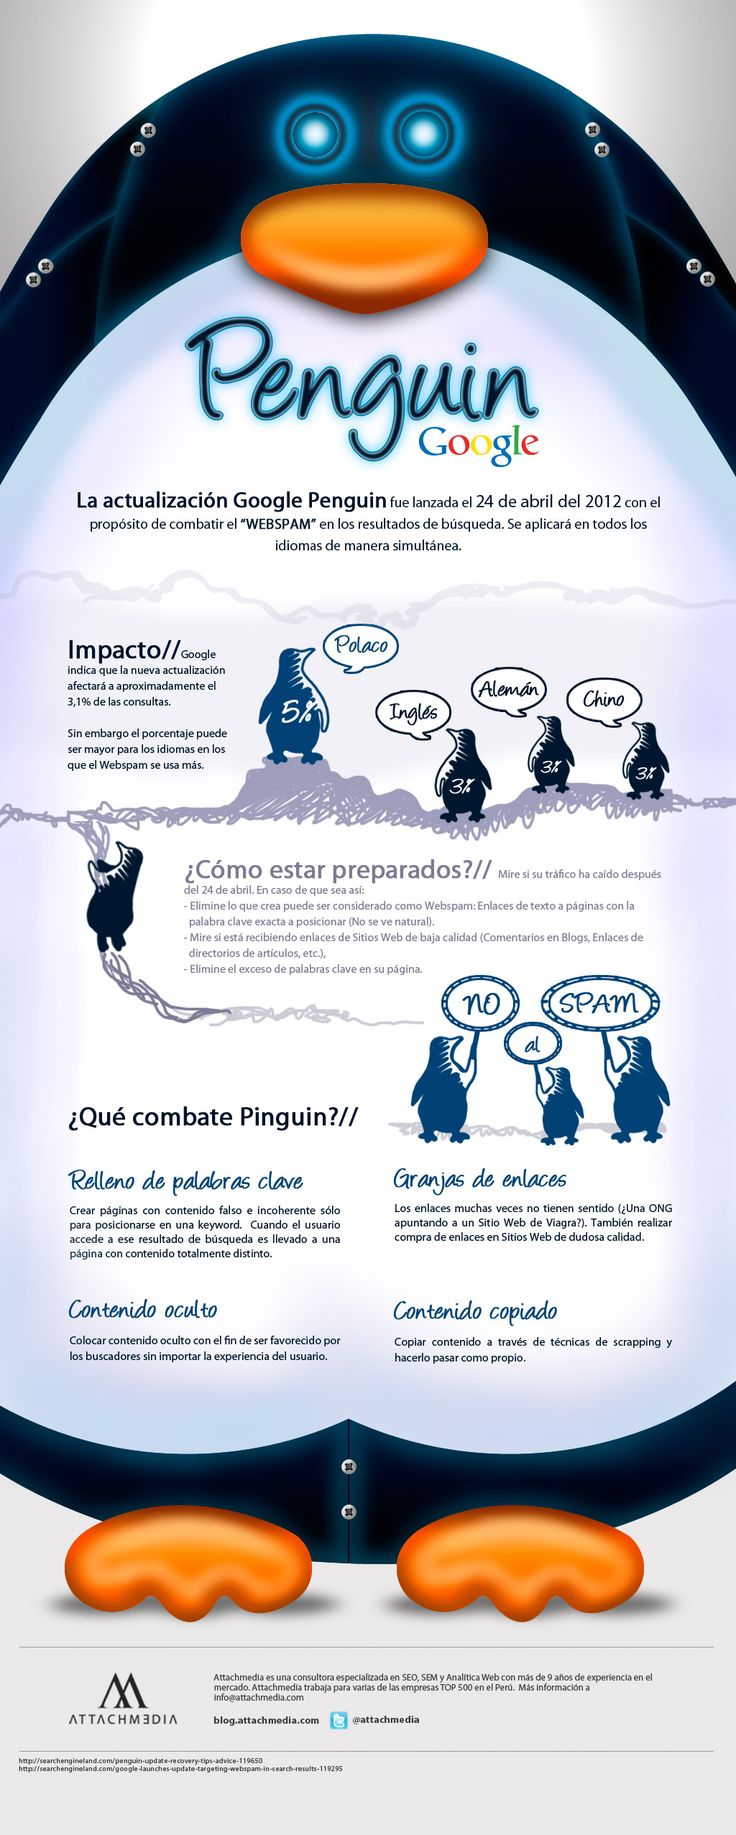 Penguin, el último esfuerzo de Google para combatir el spam [Infografía] | TreceBits - via http://bit.ly/epinner